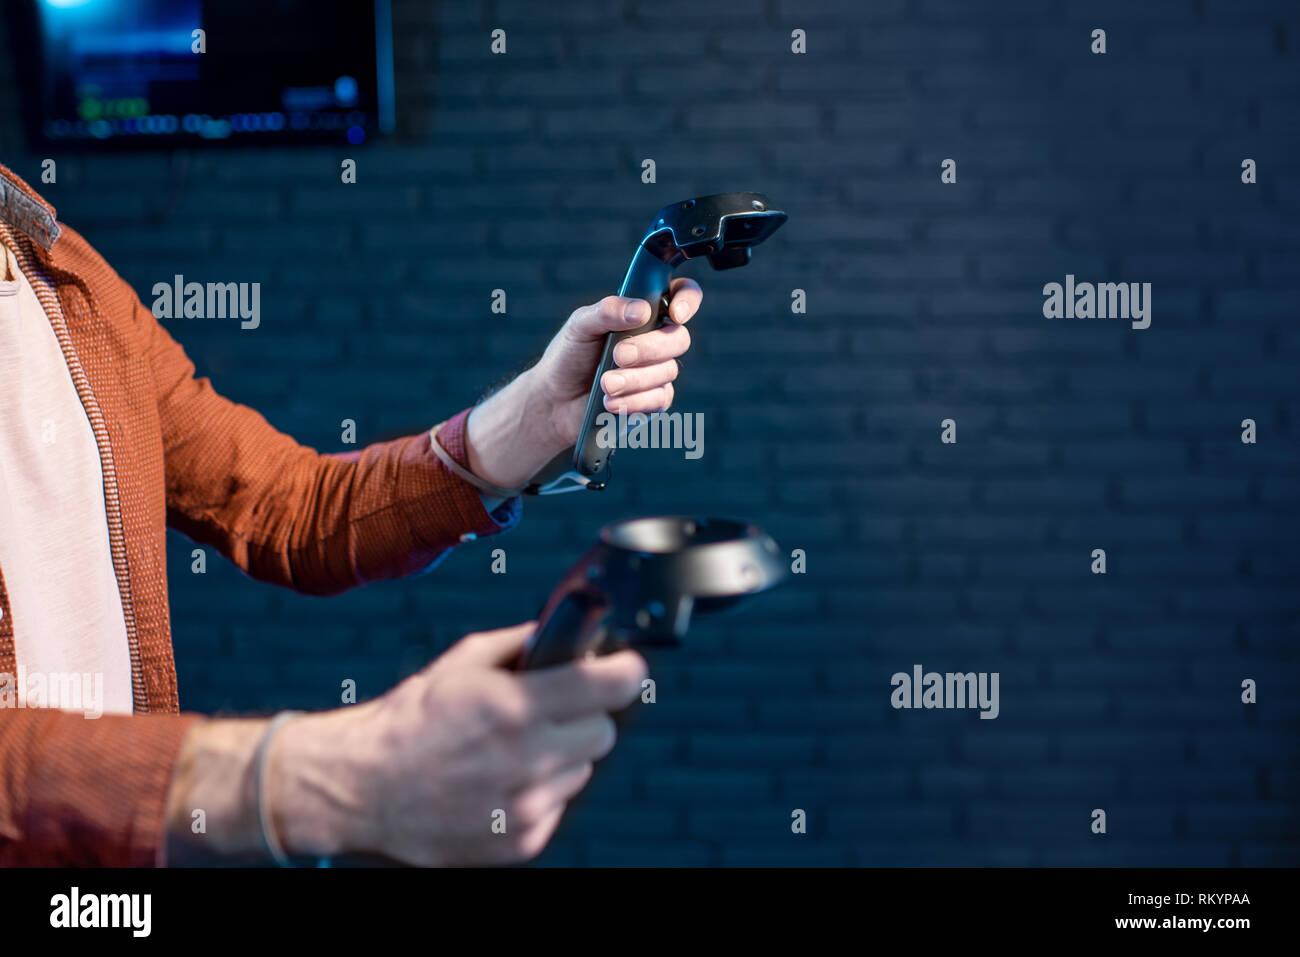 Video Game Vr Shooting Stock Photos & Video Game Vr Shooting